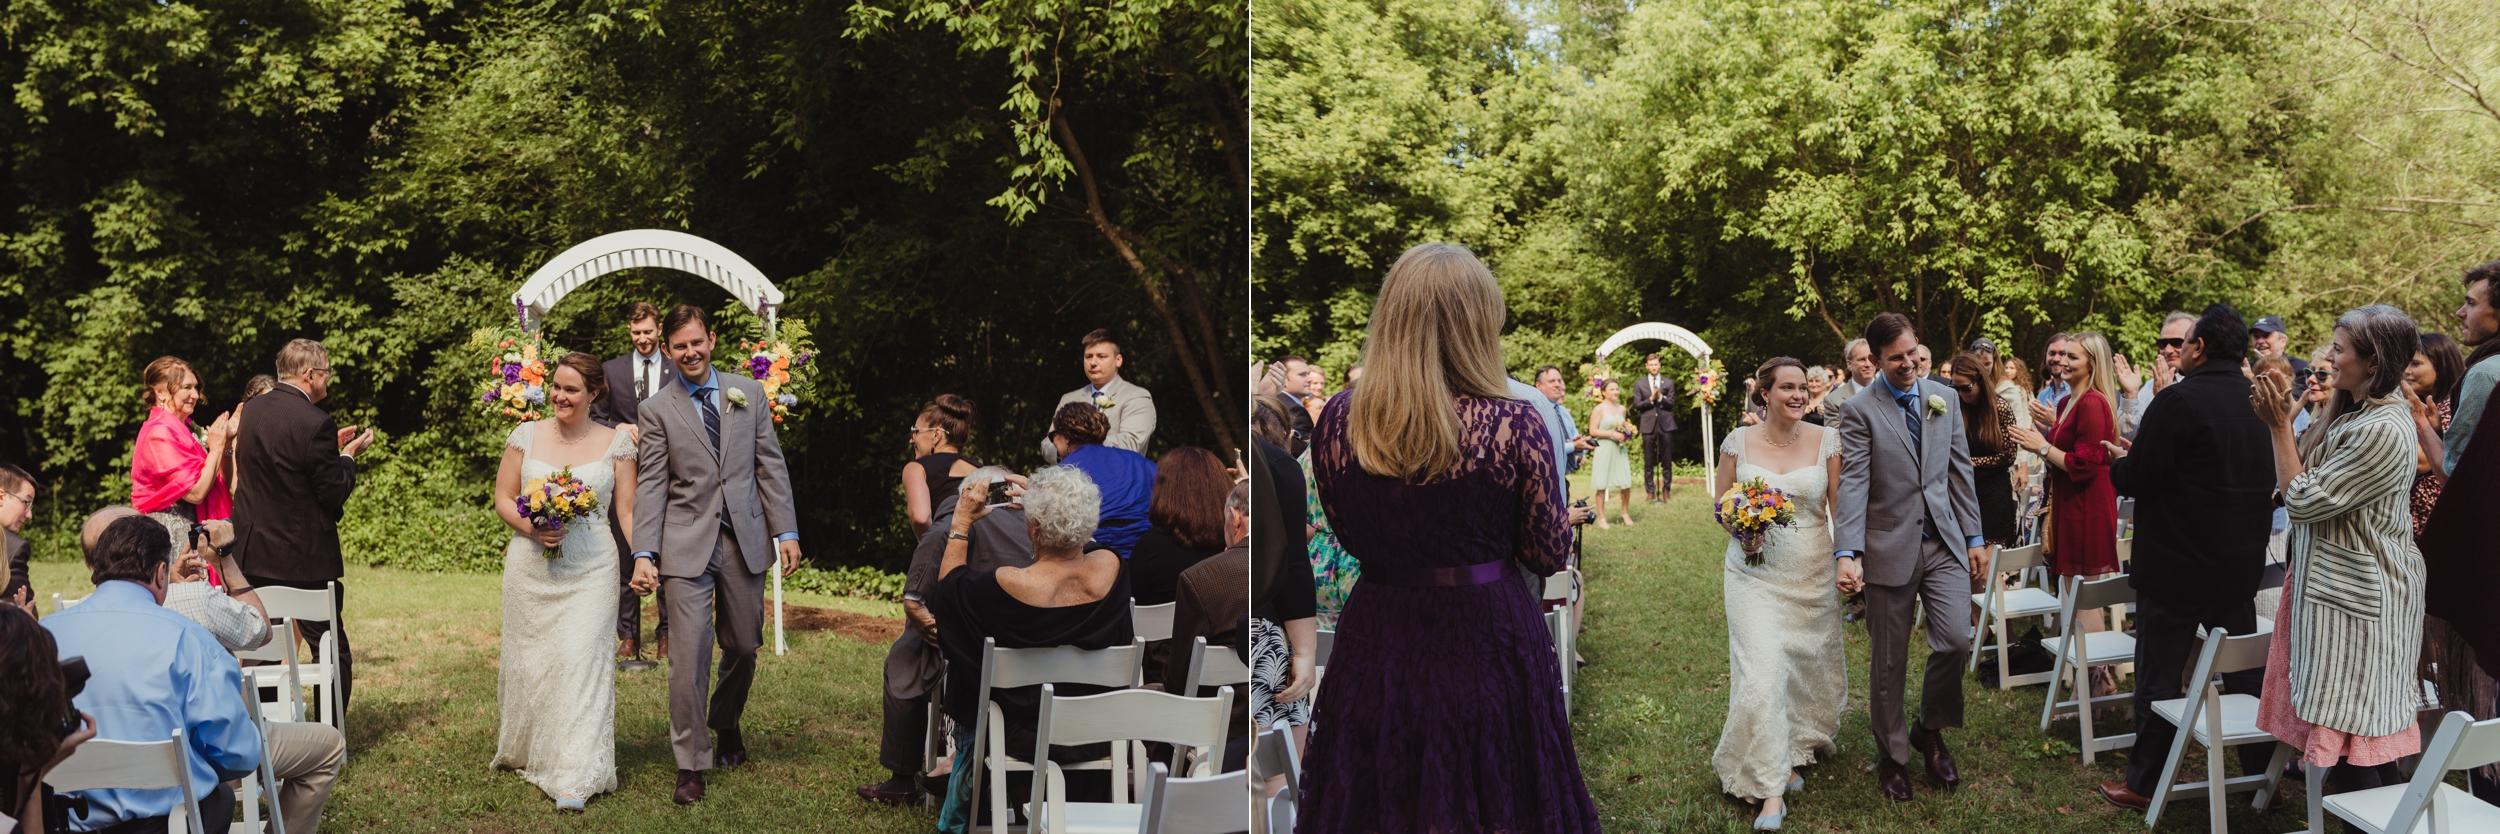 037-highland-dell-lodge-russian-river-wedding-vivianchen-222_WEB.jpg